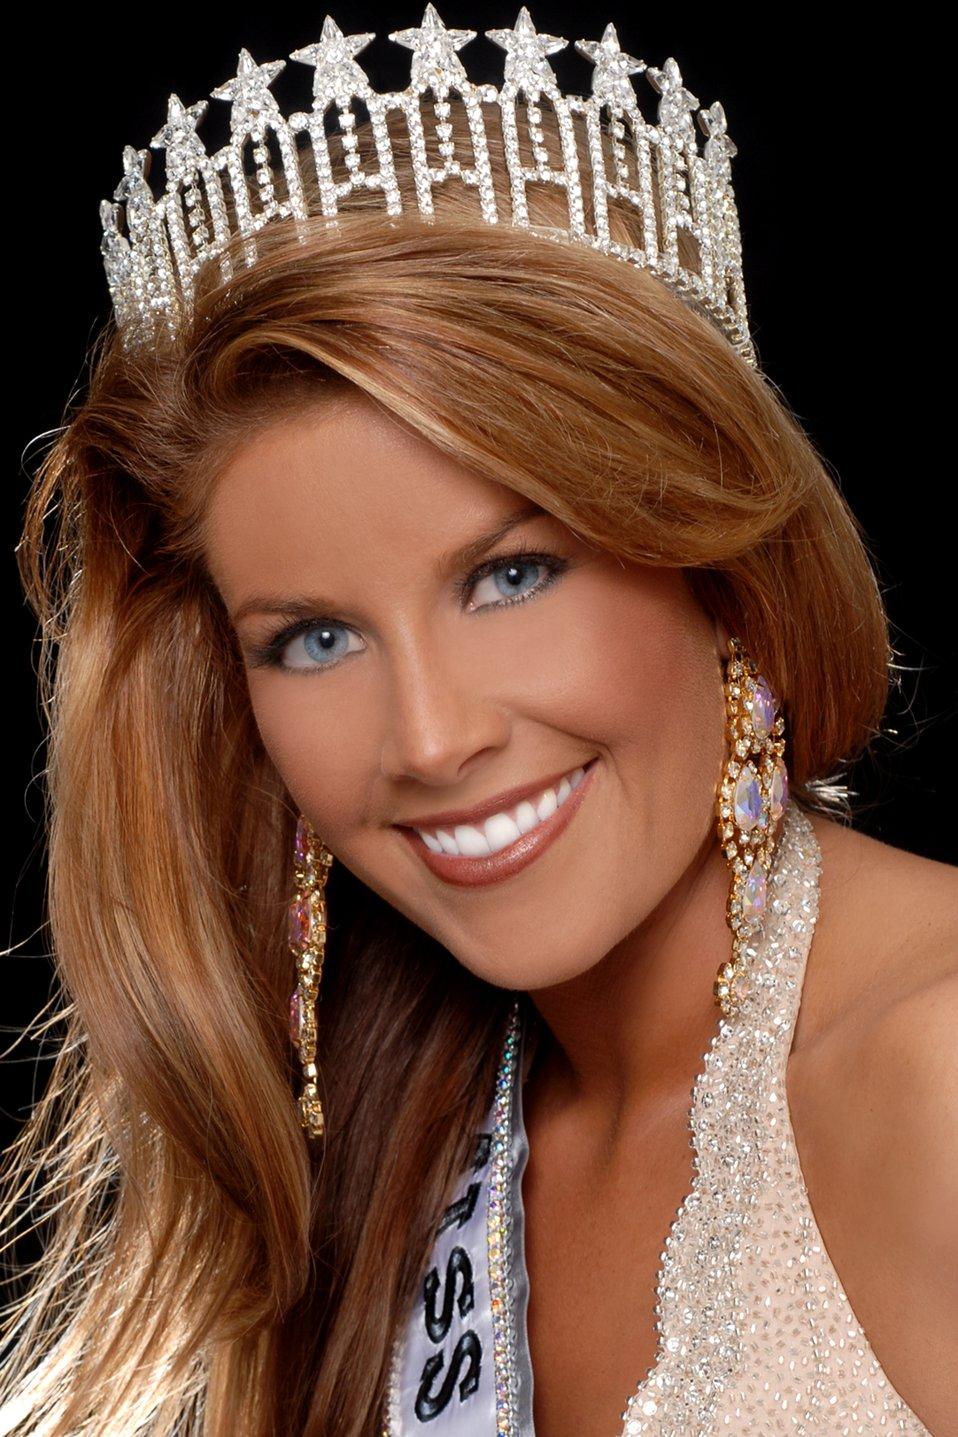 Airman selected as Miss Arkansas USA